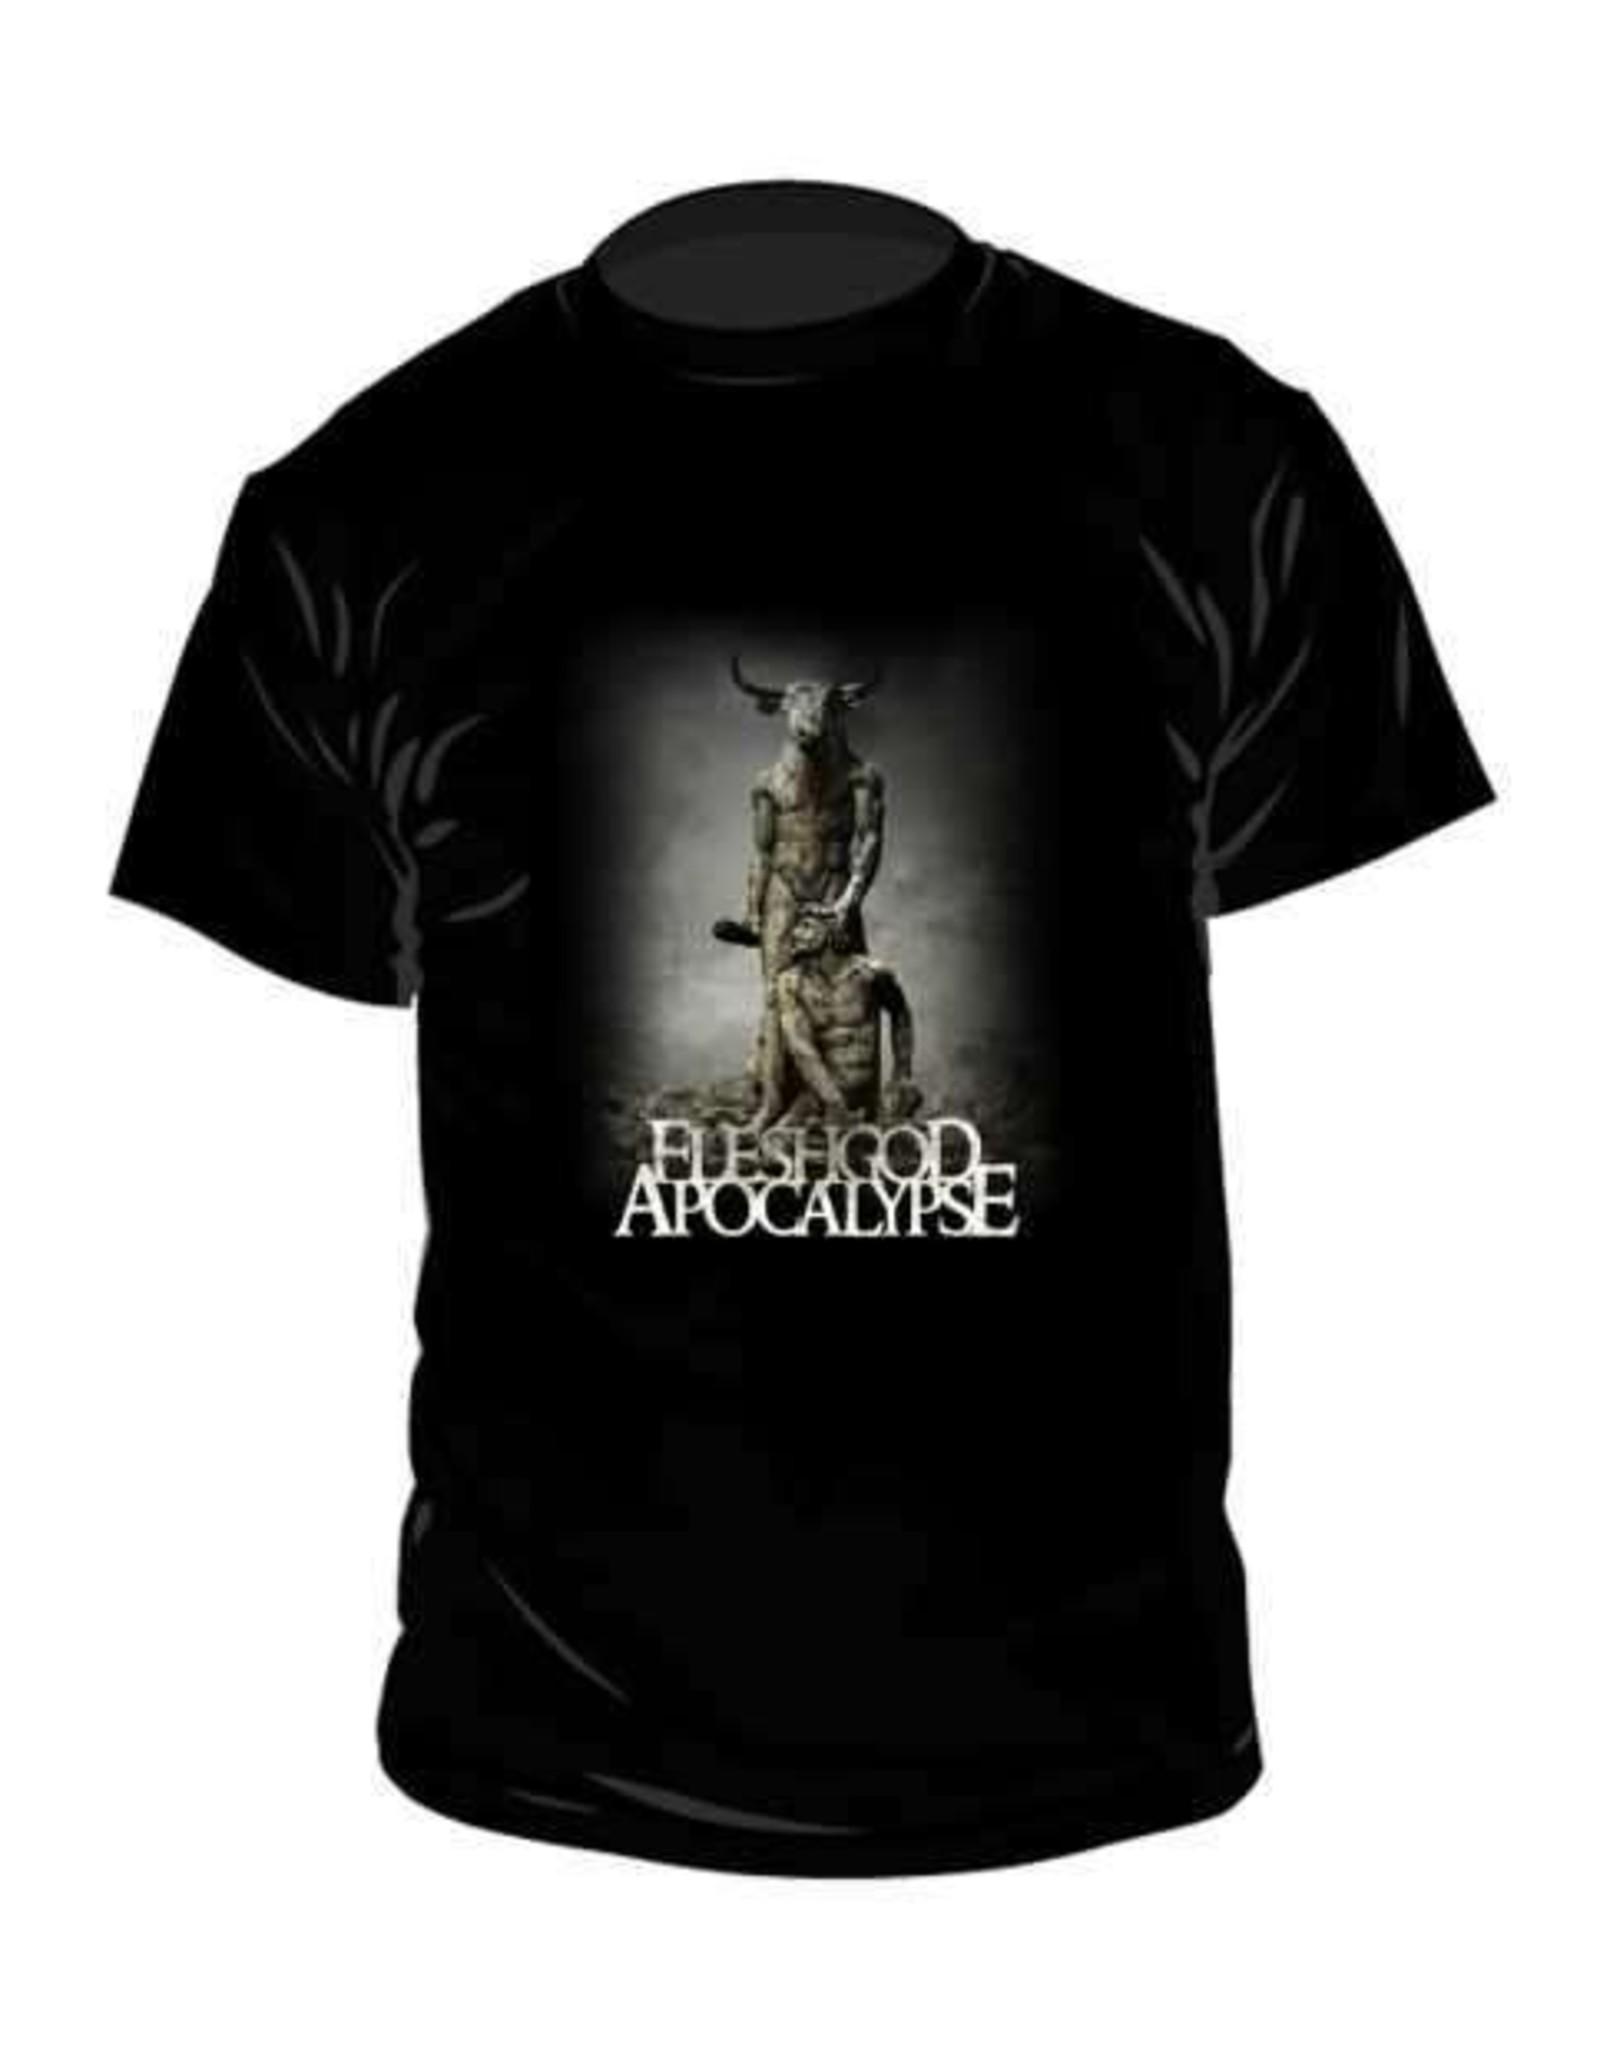 Fleshgod Apocalypse Minotaur T-Shirt